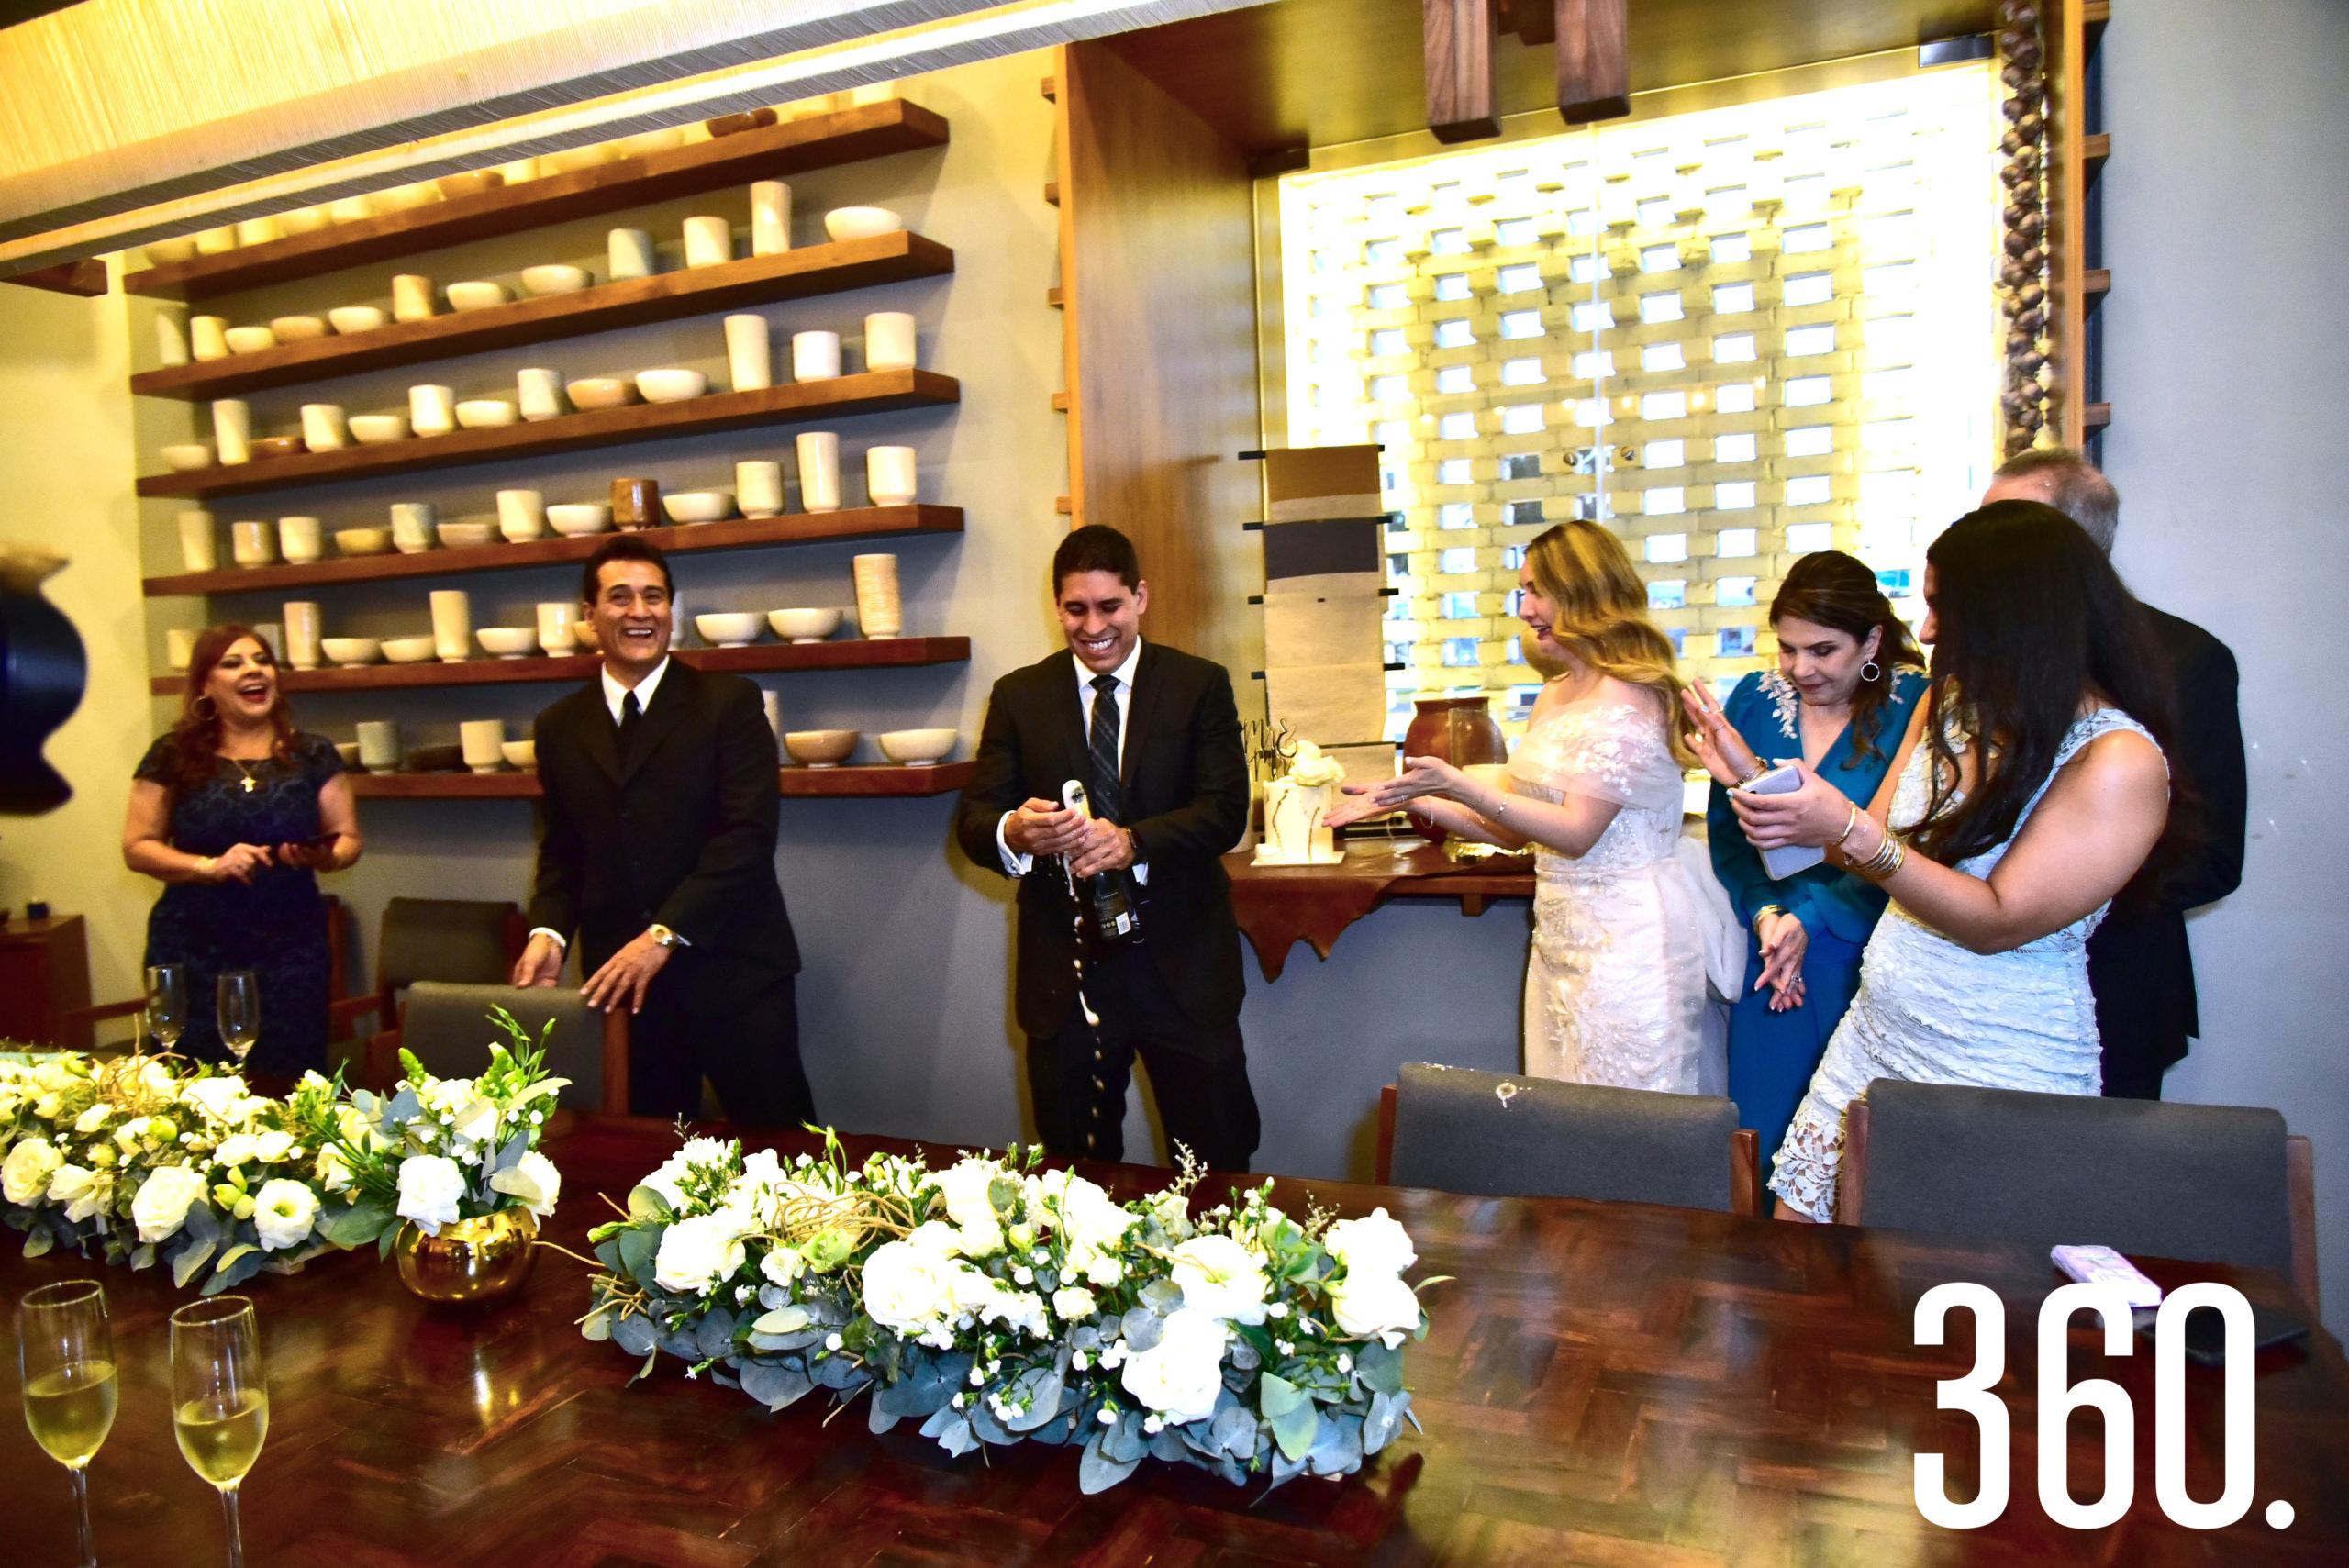 Durante la ceremonia civil.